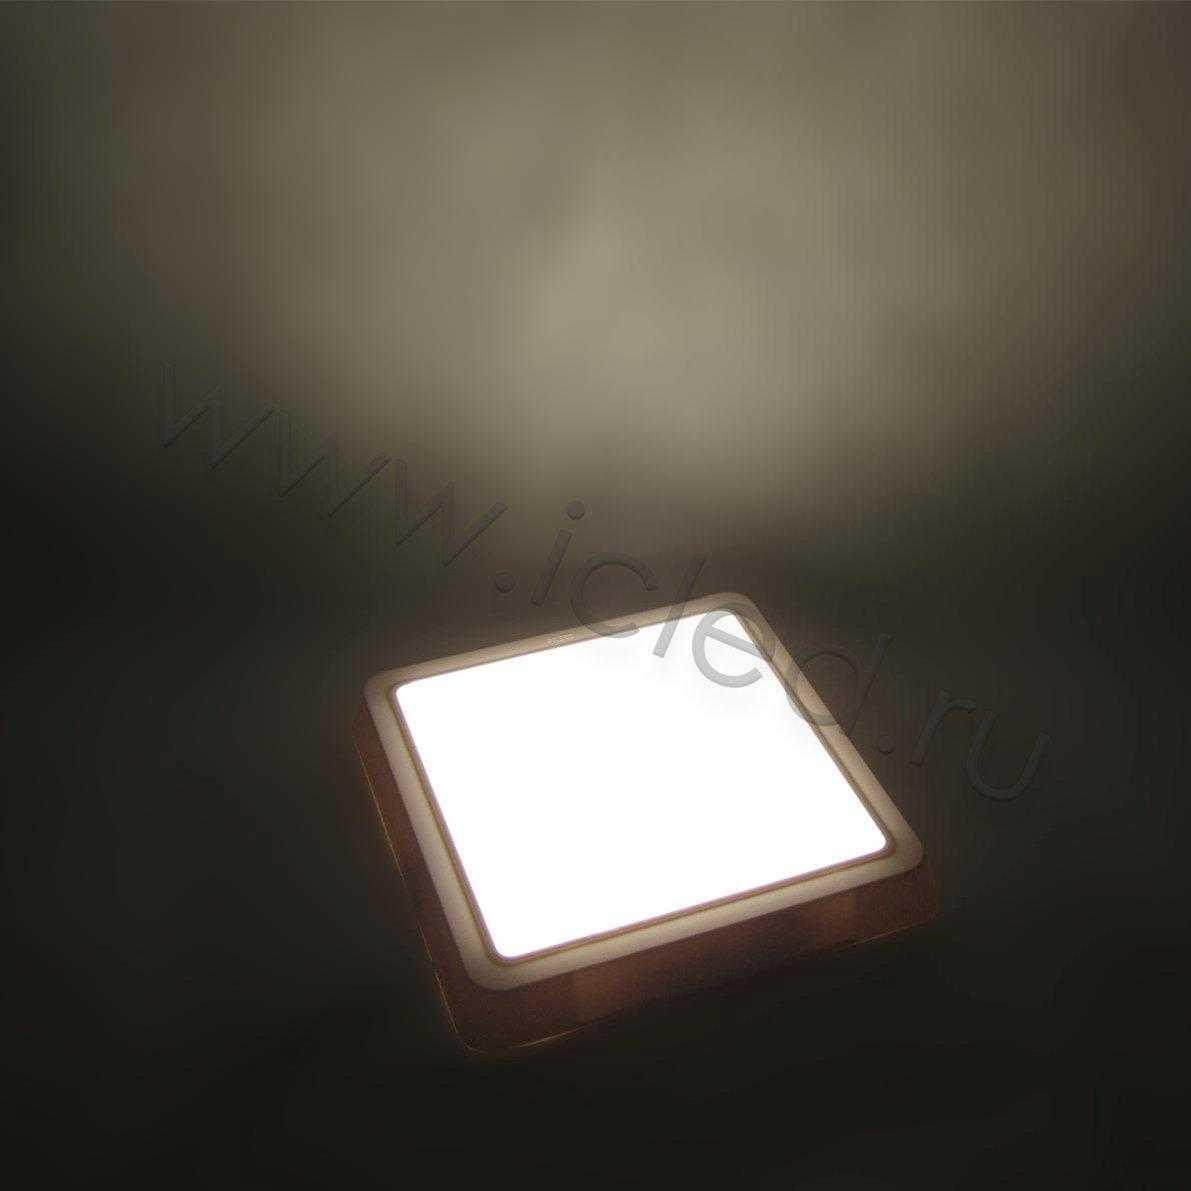 Светодиодный светильник MR-SW L230 (12W, Warm White)